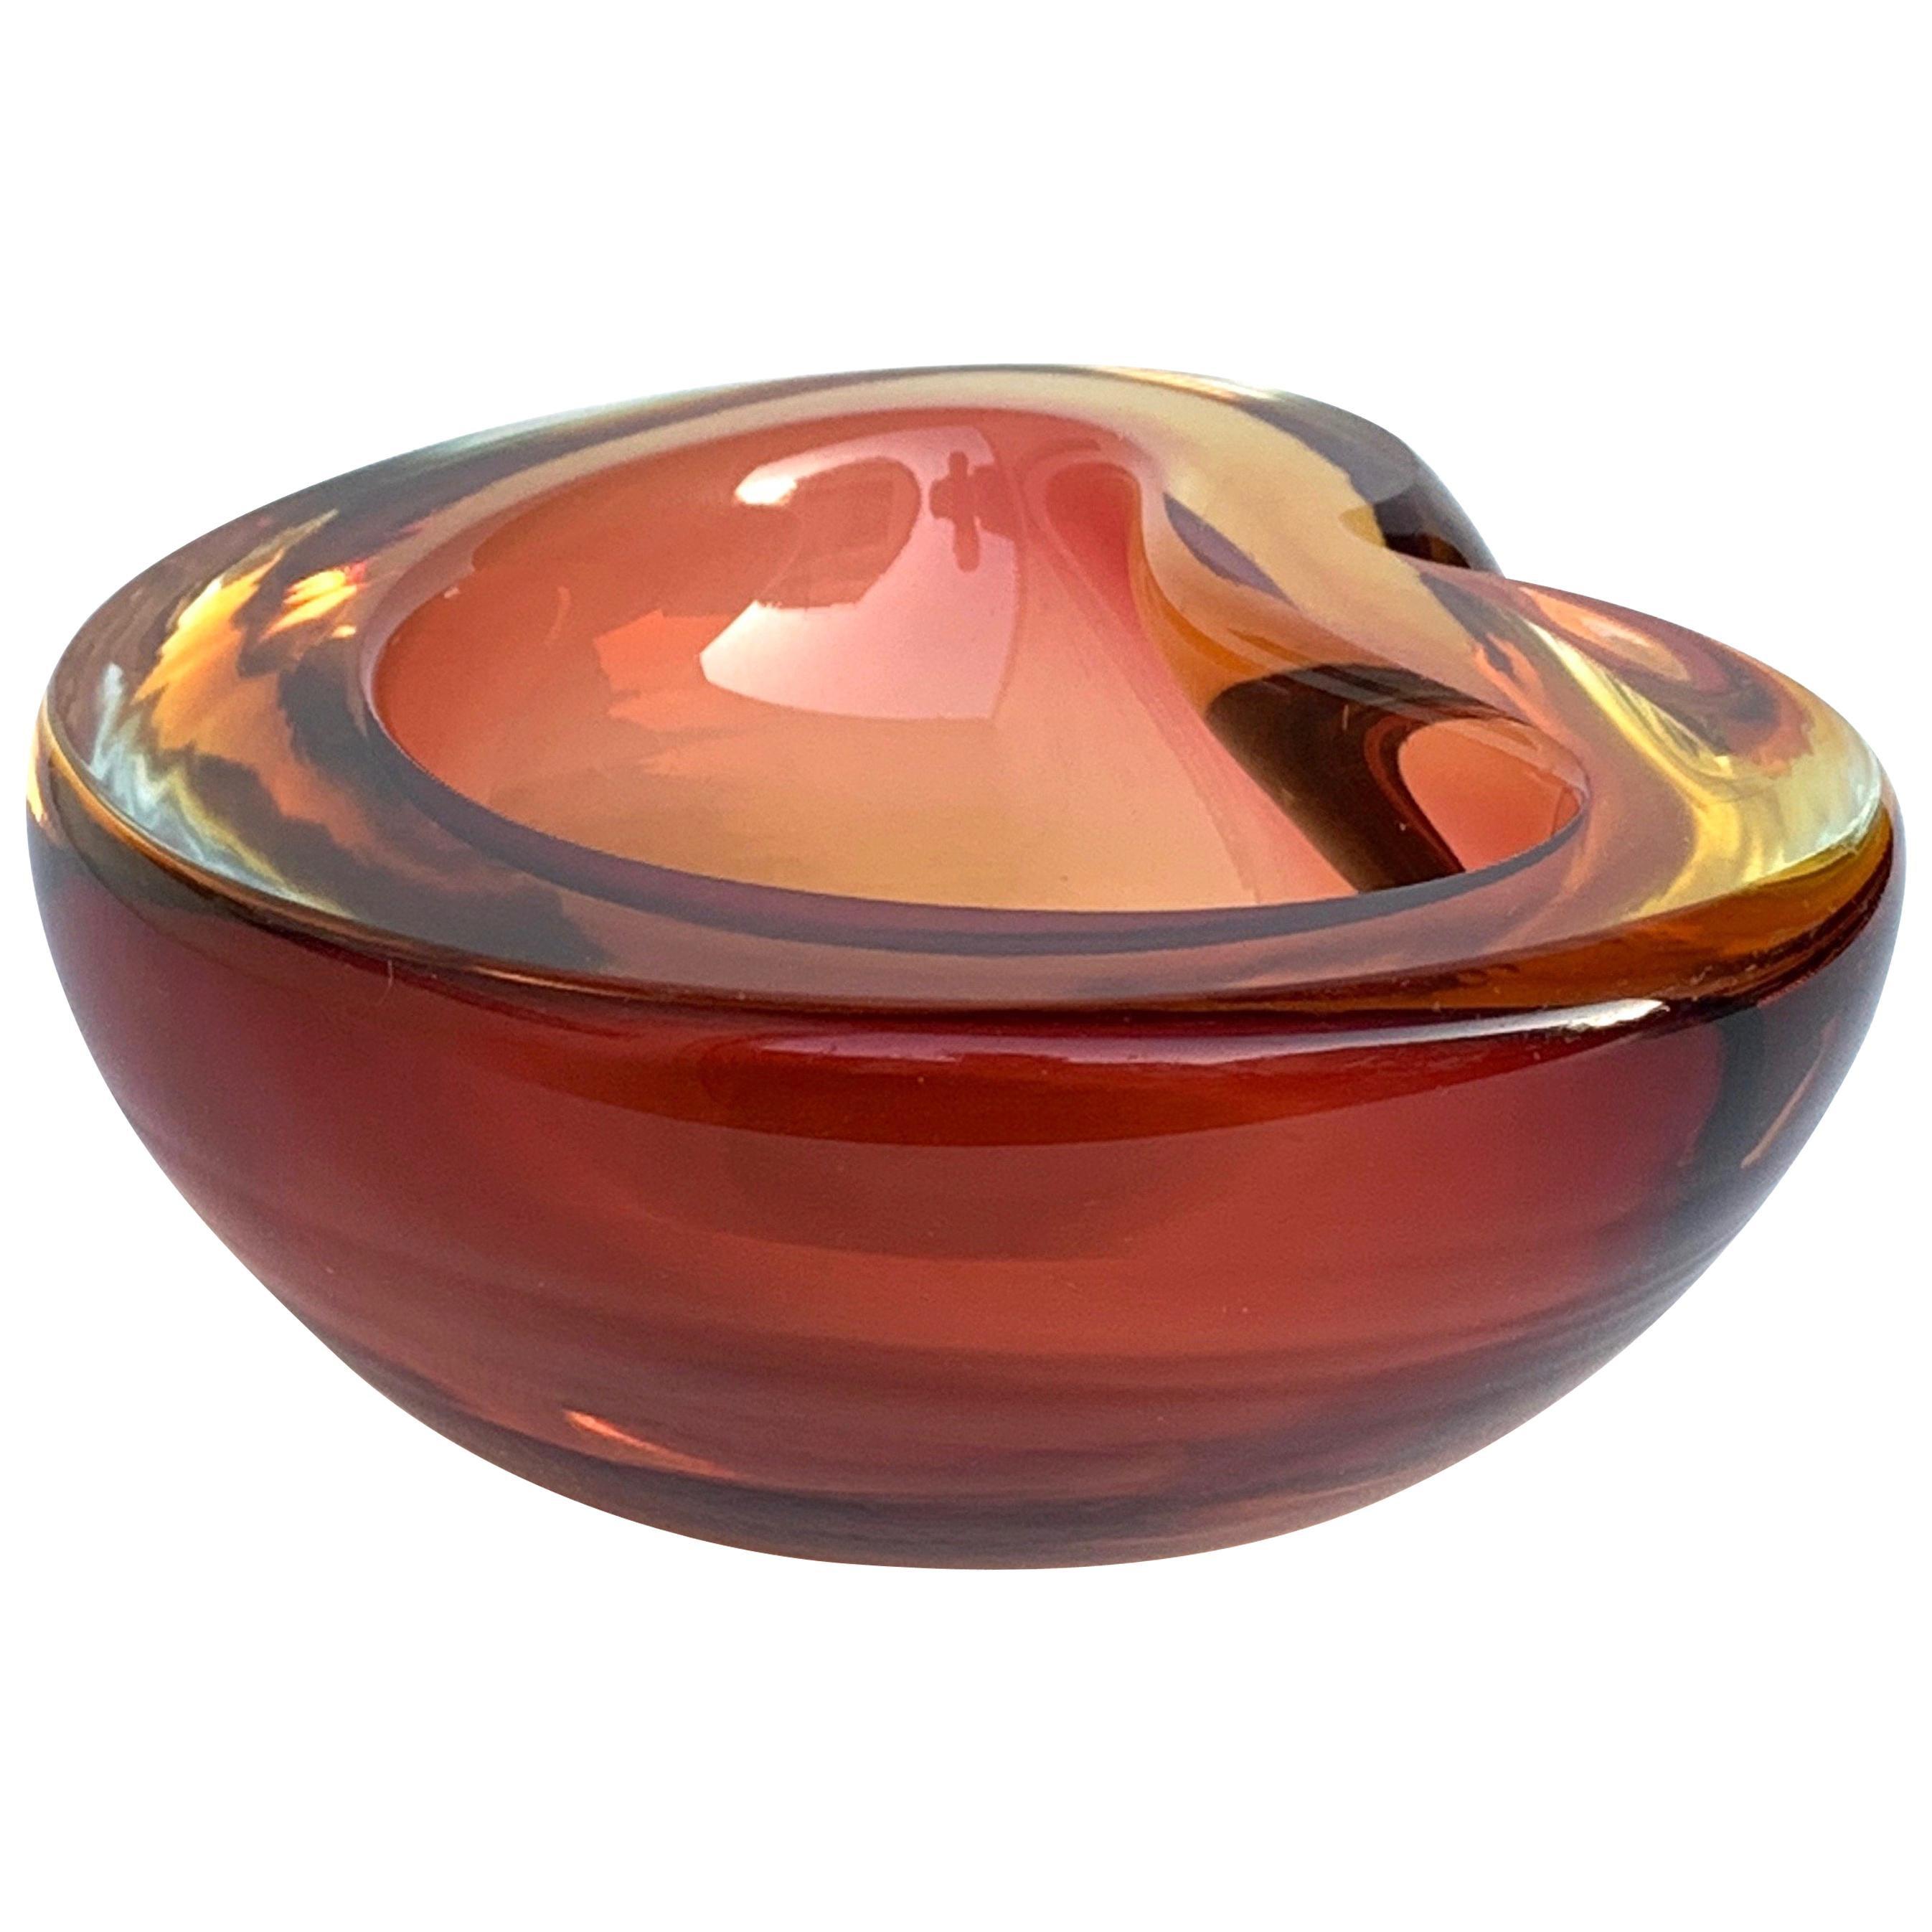 Murano Ashtray, Alfredo Barbini, Submerged Glass, Color Amber, Italy, 1960s